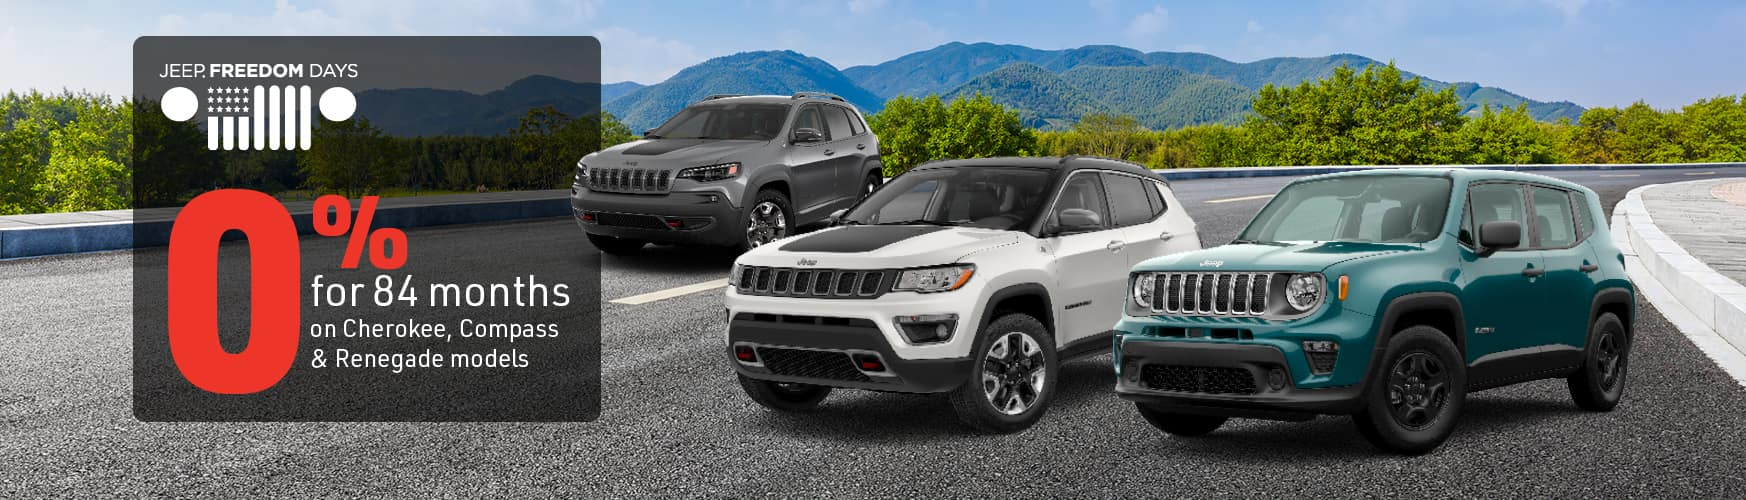 90582-cjdc-banner-3-jeeps